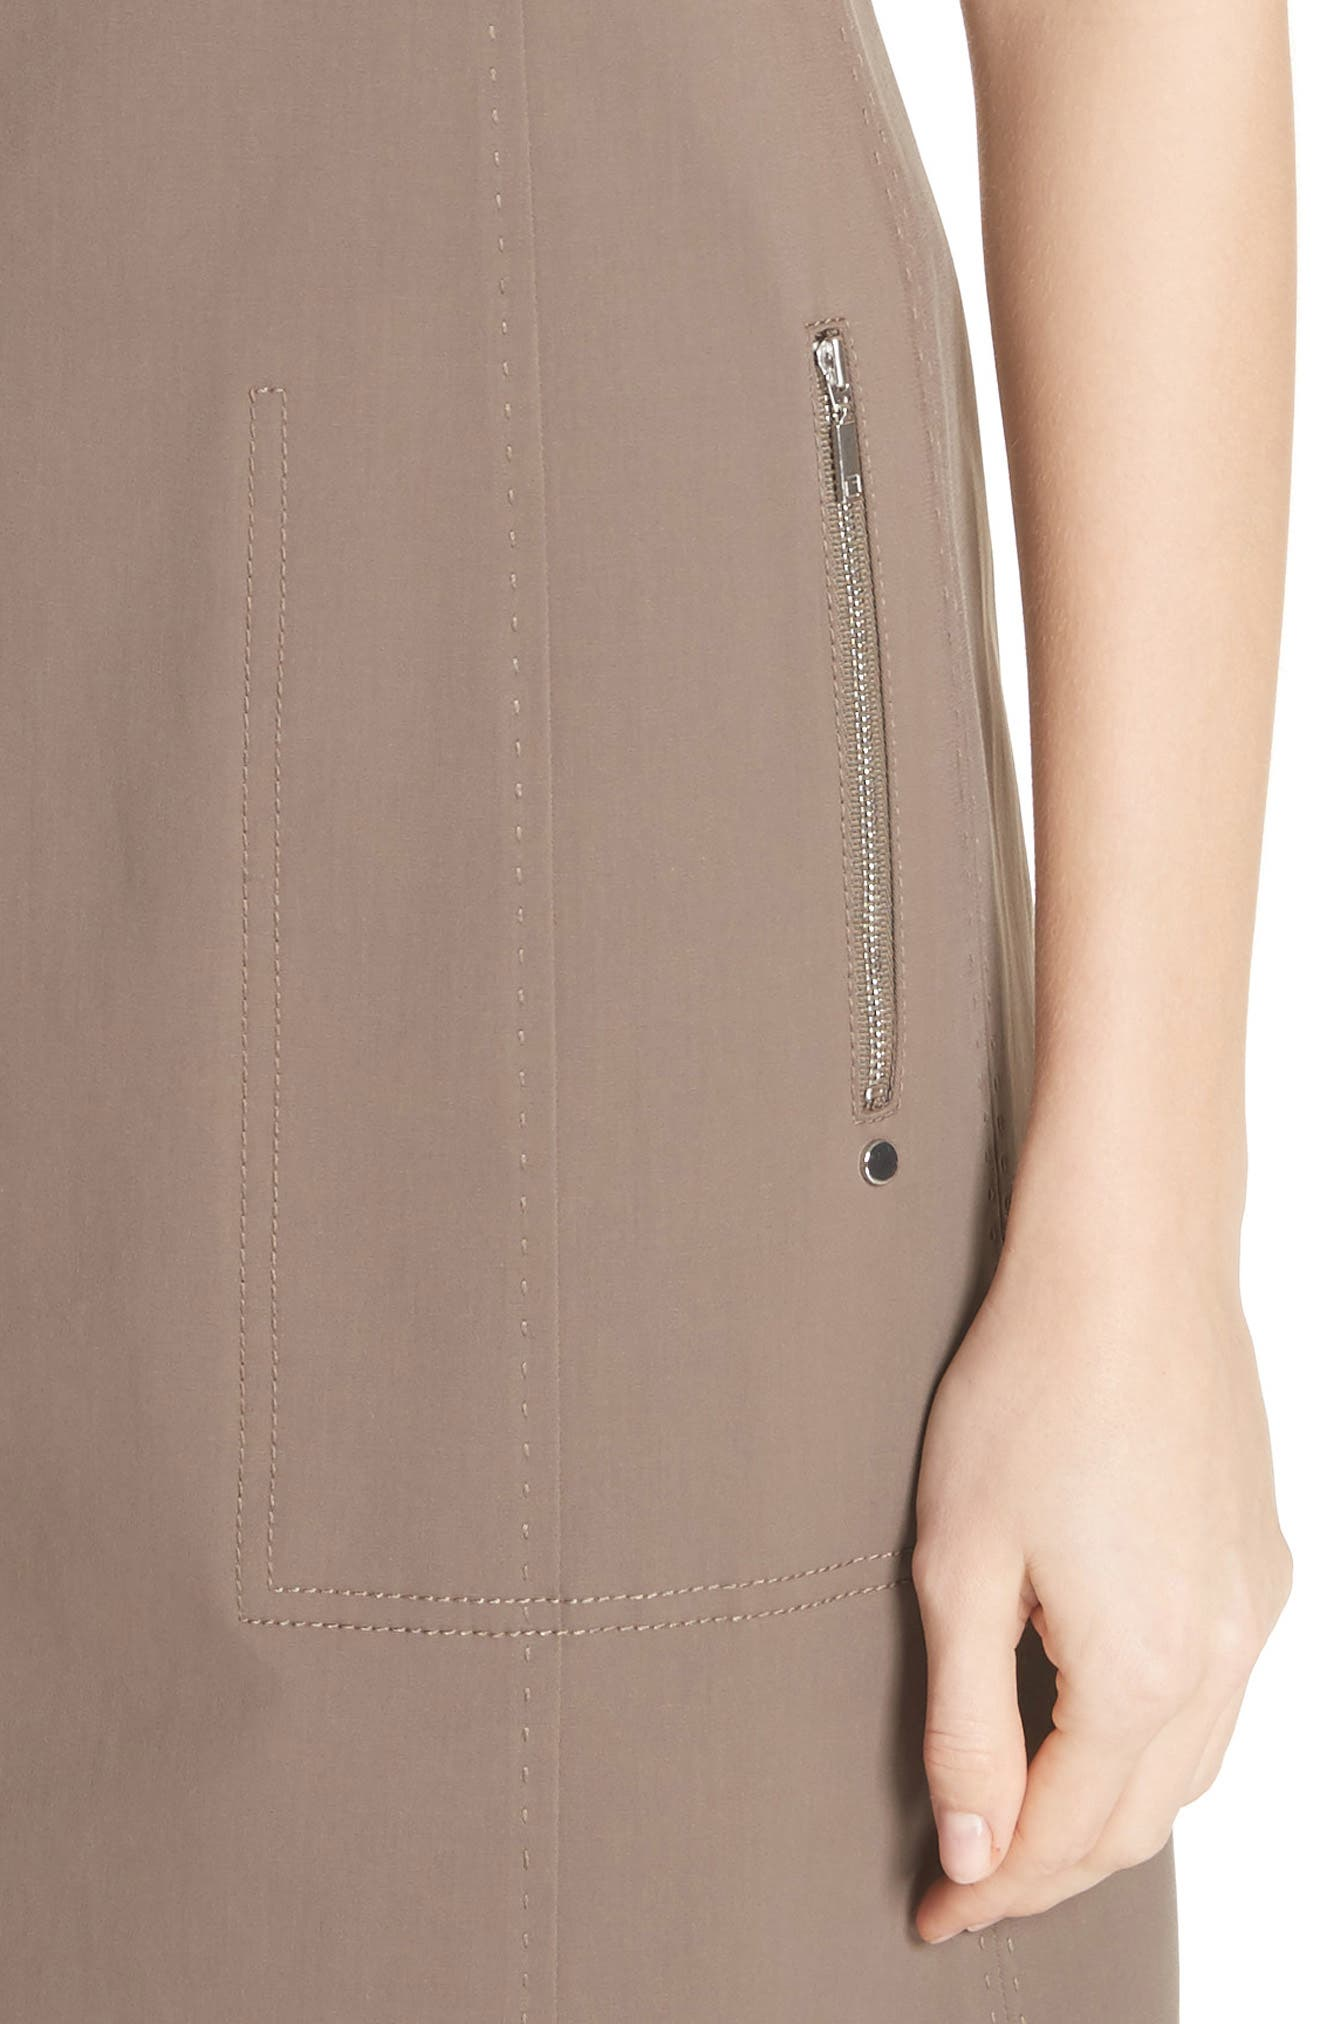 Paxton Sleeveless Sheath Dress,                             Alternate thumbnail 4, color,                             Nougat